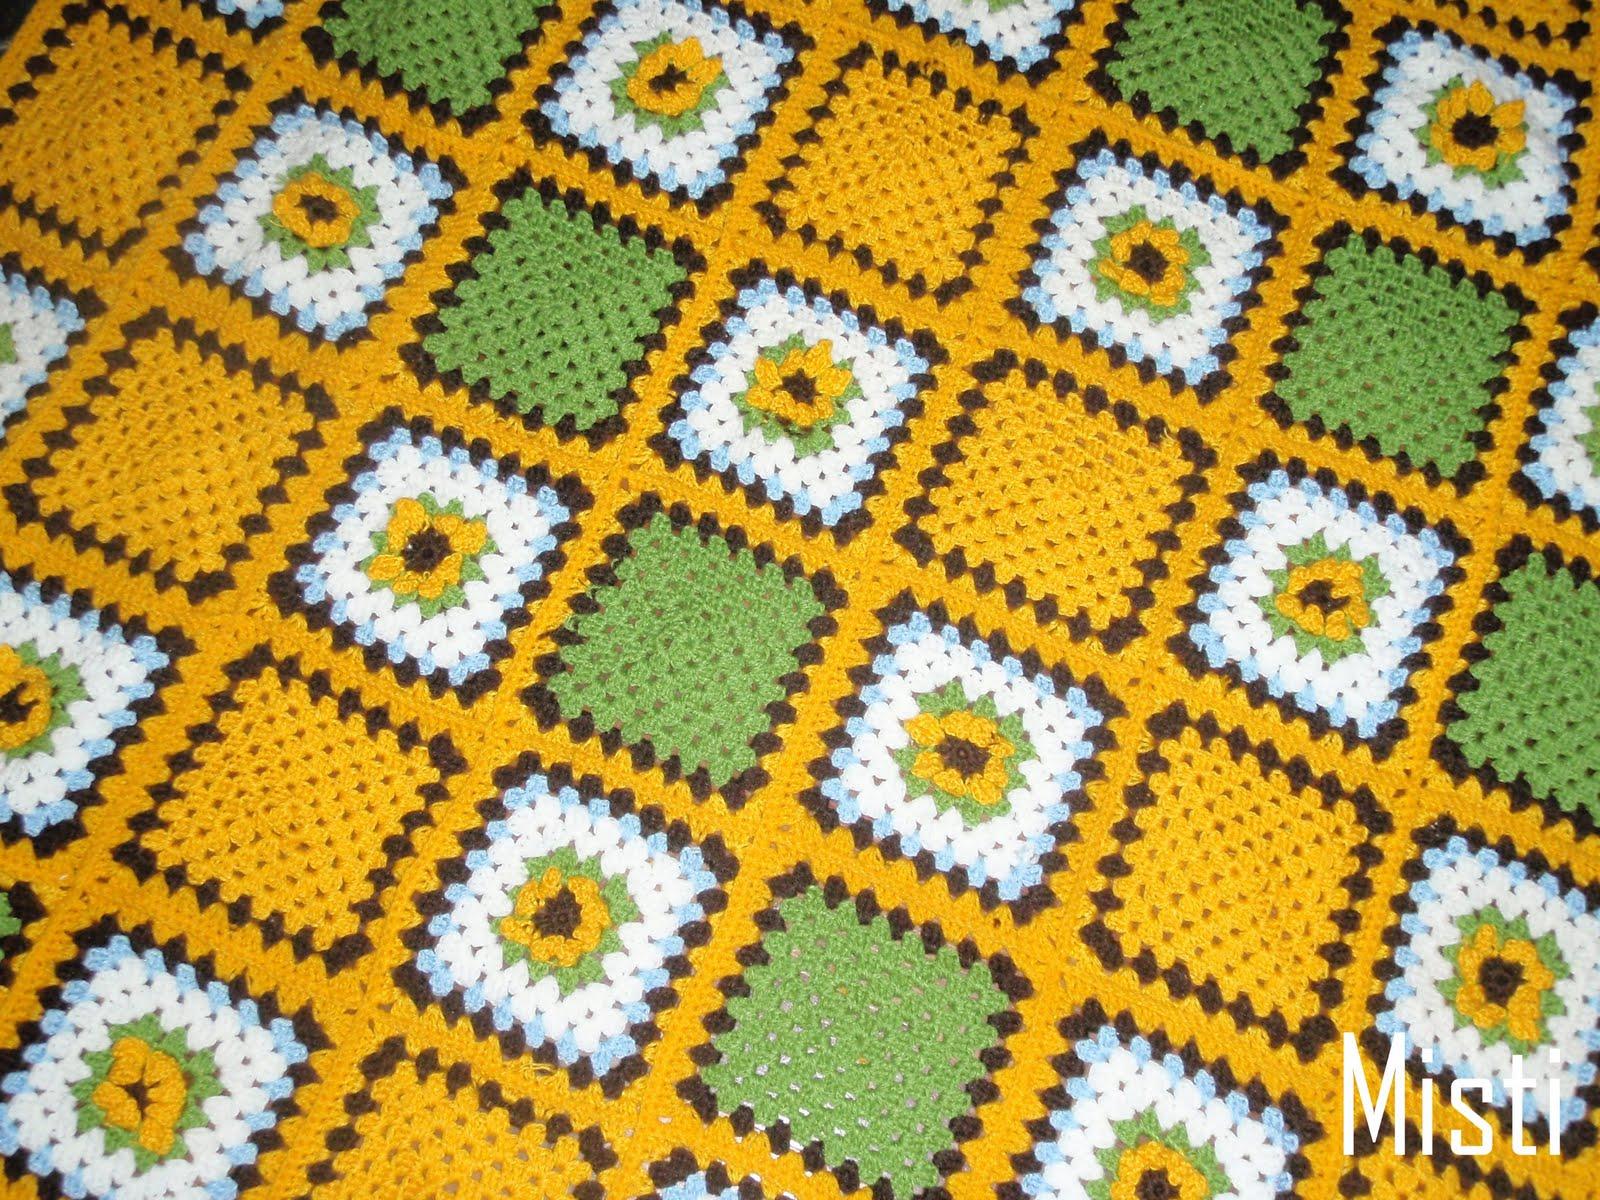 Misti Crochet: My Sunflower Blankie